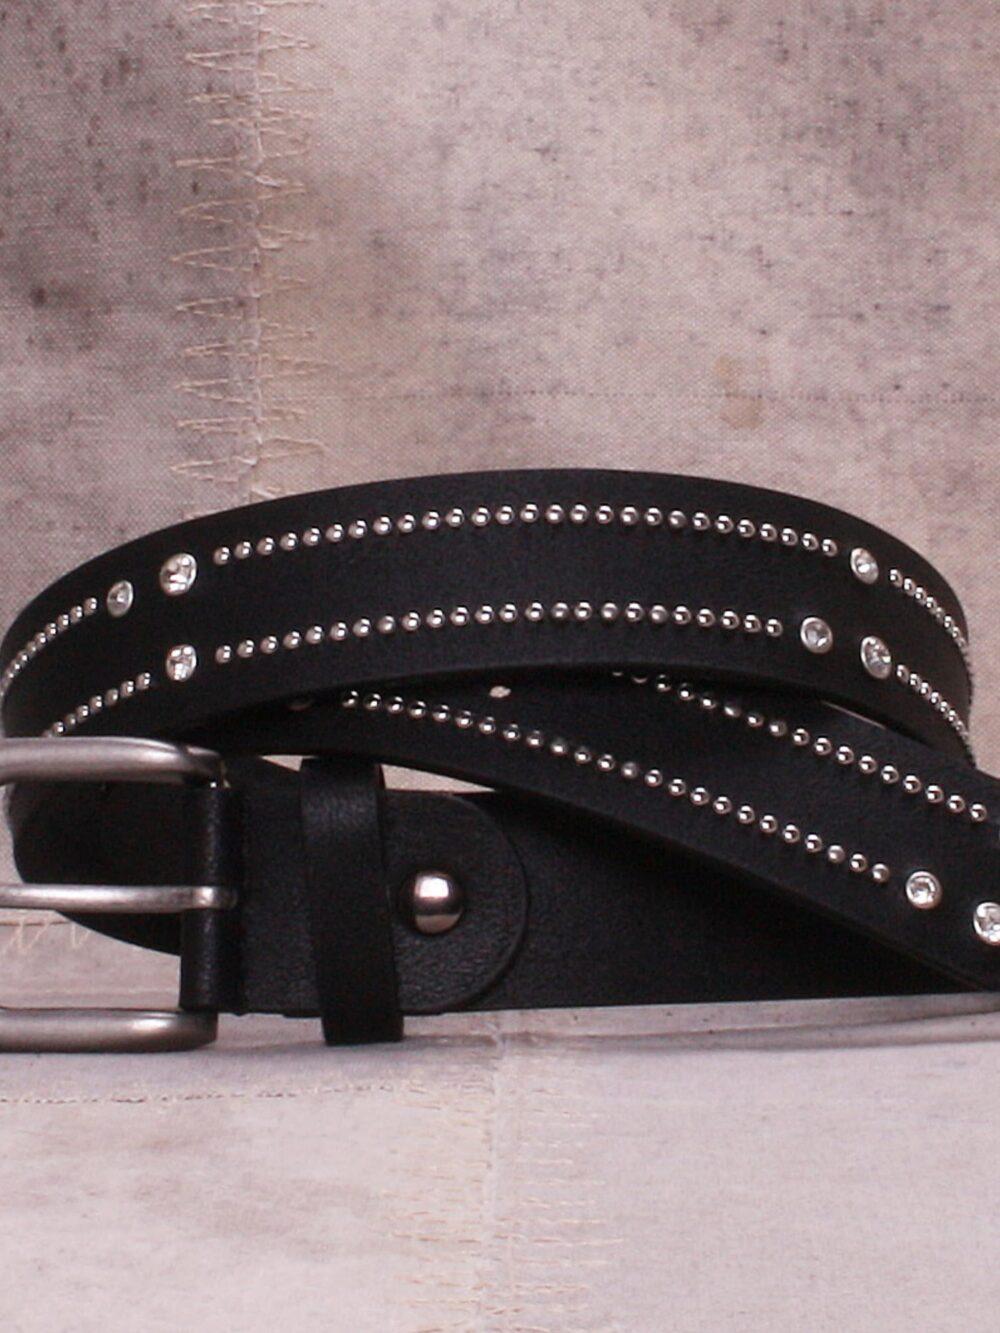 Bæltekompagniet Black belt with strass and rivets